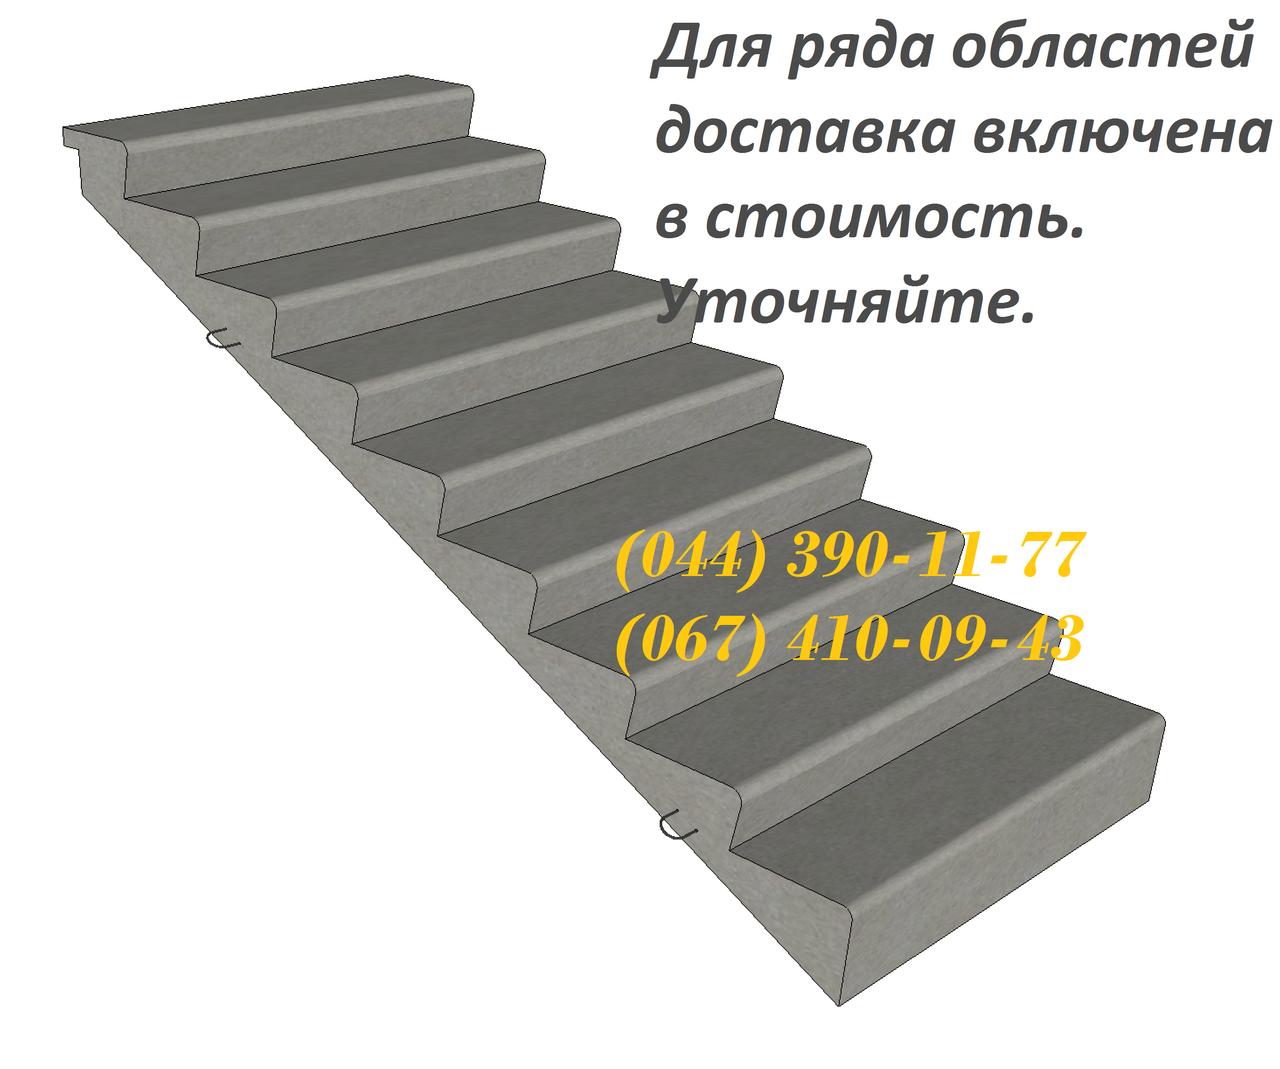 Цена лестницы жби алапаевский железобетонные